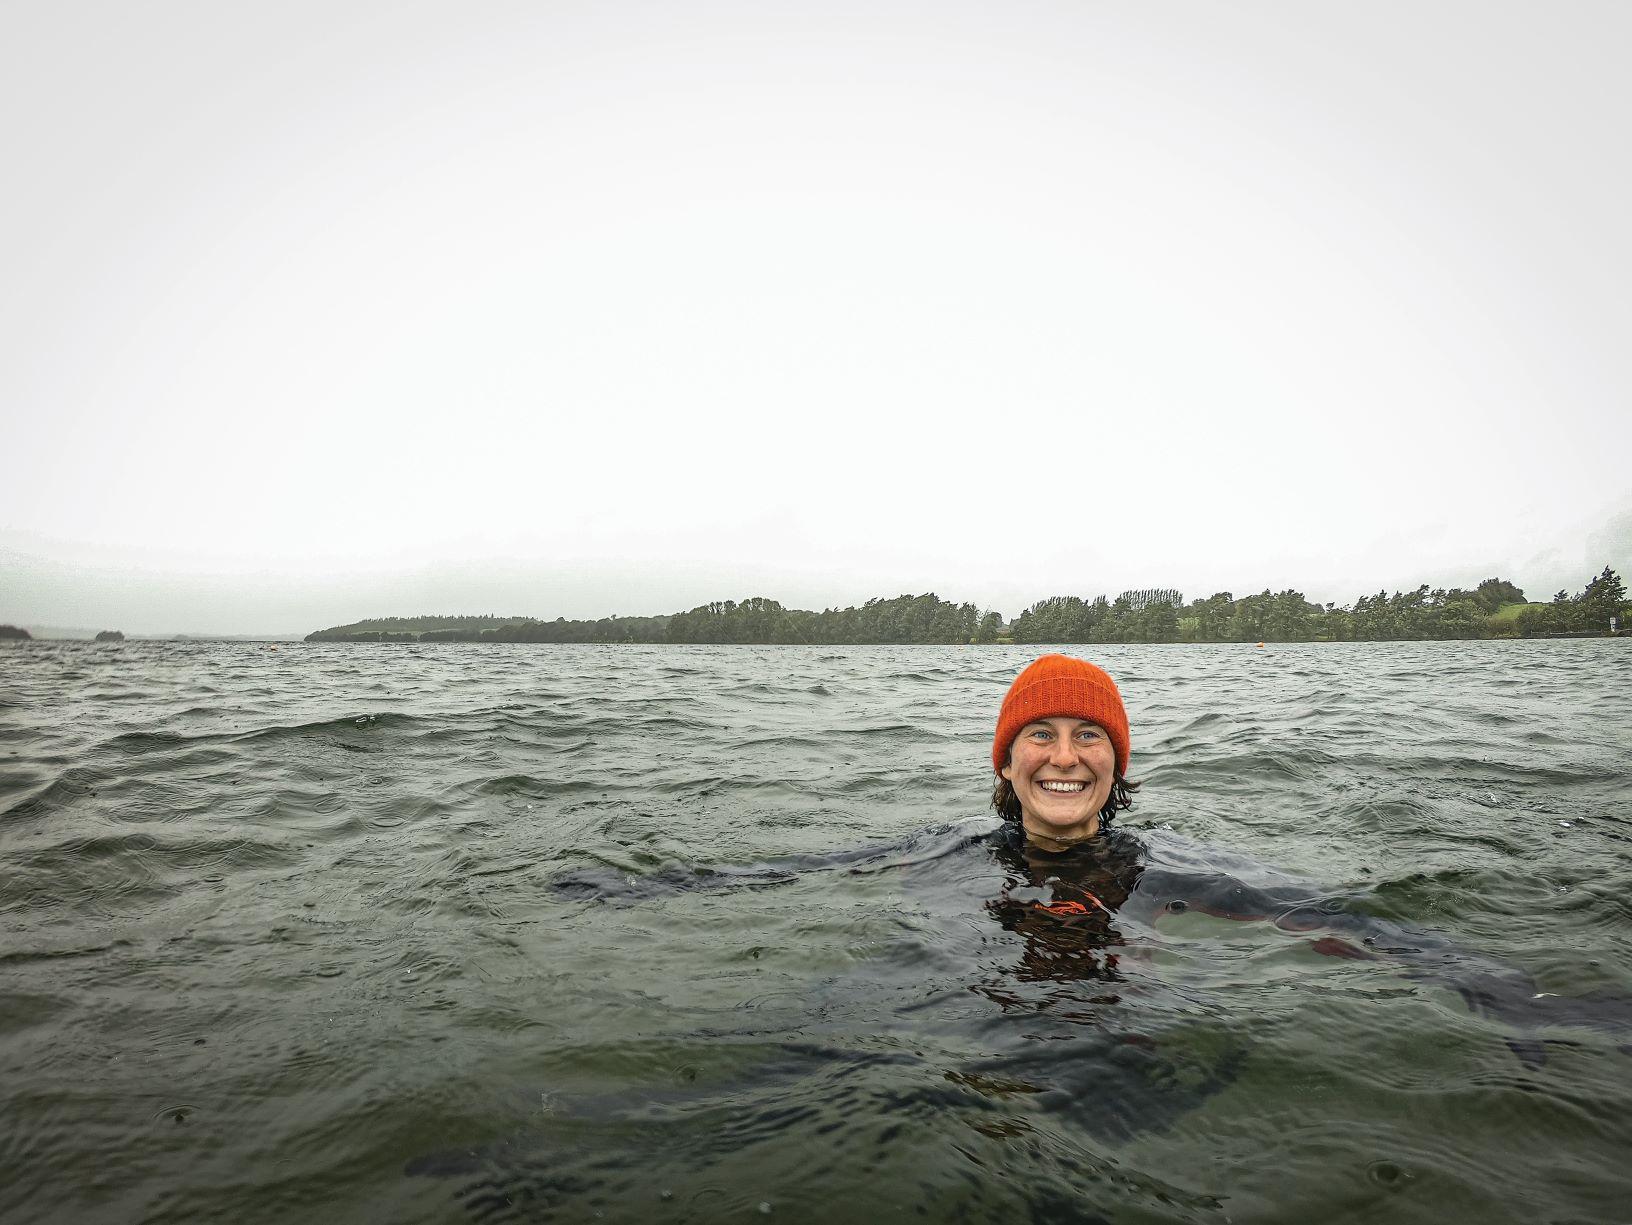 Kerri ni Dochartaigh floating in the rainy sea with an orange woolly hat on